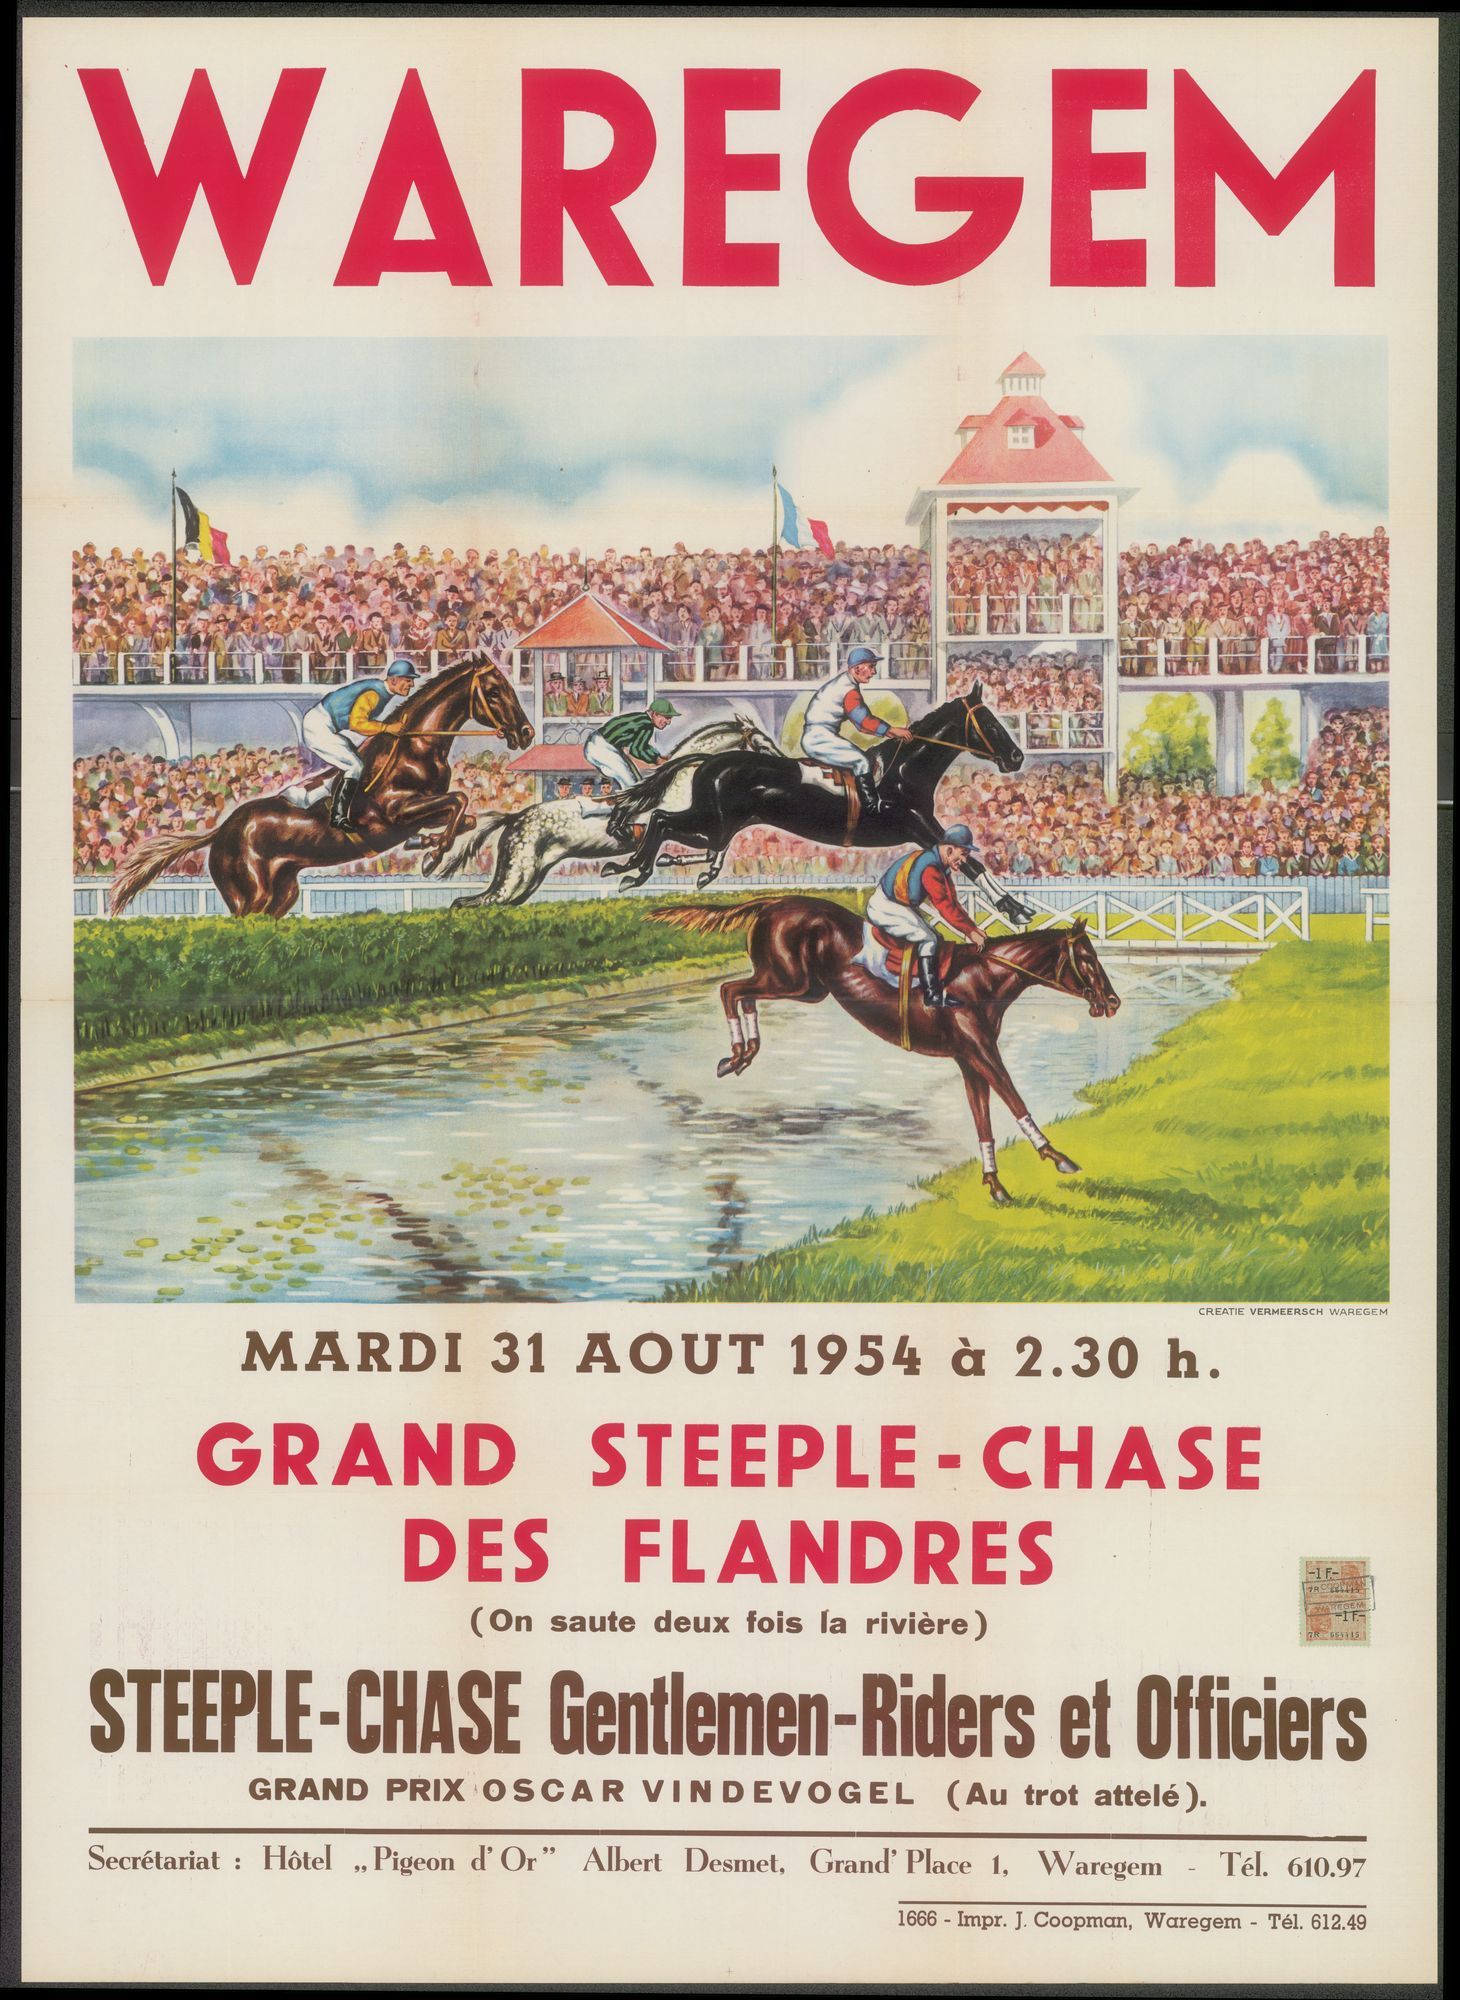 Grand Steeple-Chase des Flandres, Steeple-Chase Gentlemen-Riders et Officiers, mardi 31 Aout 1954